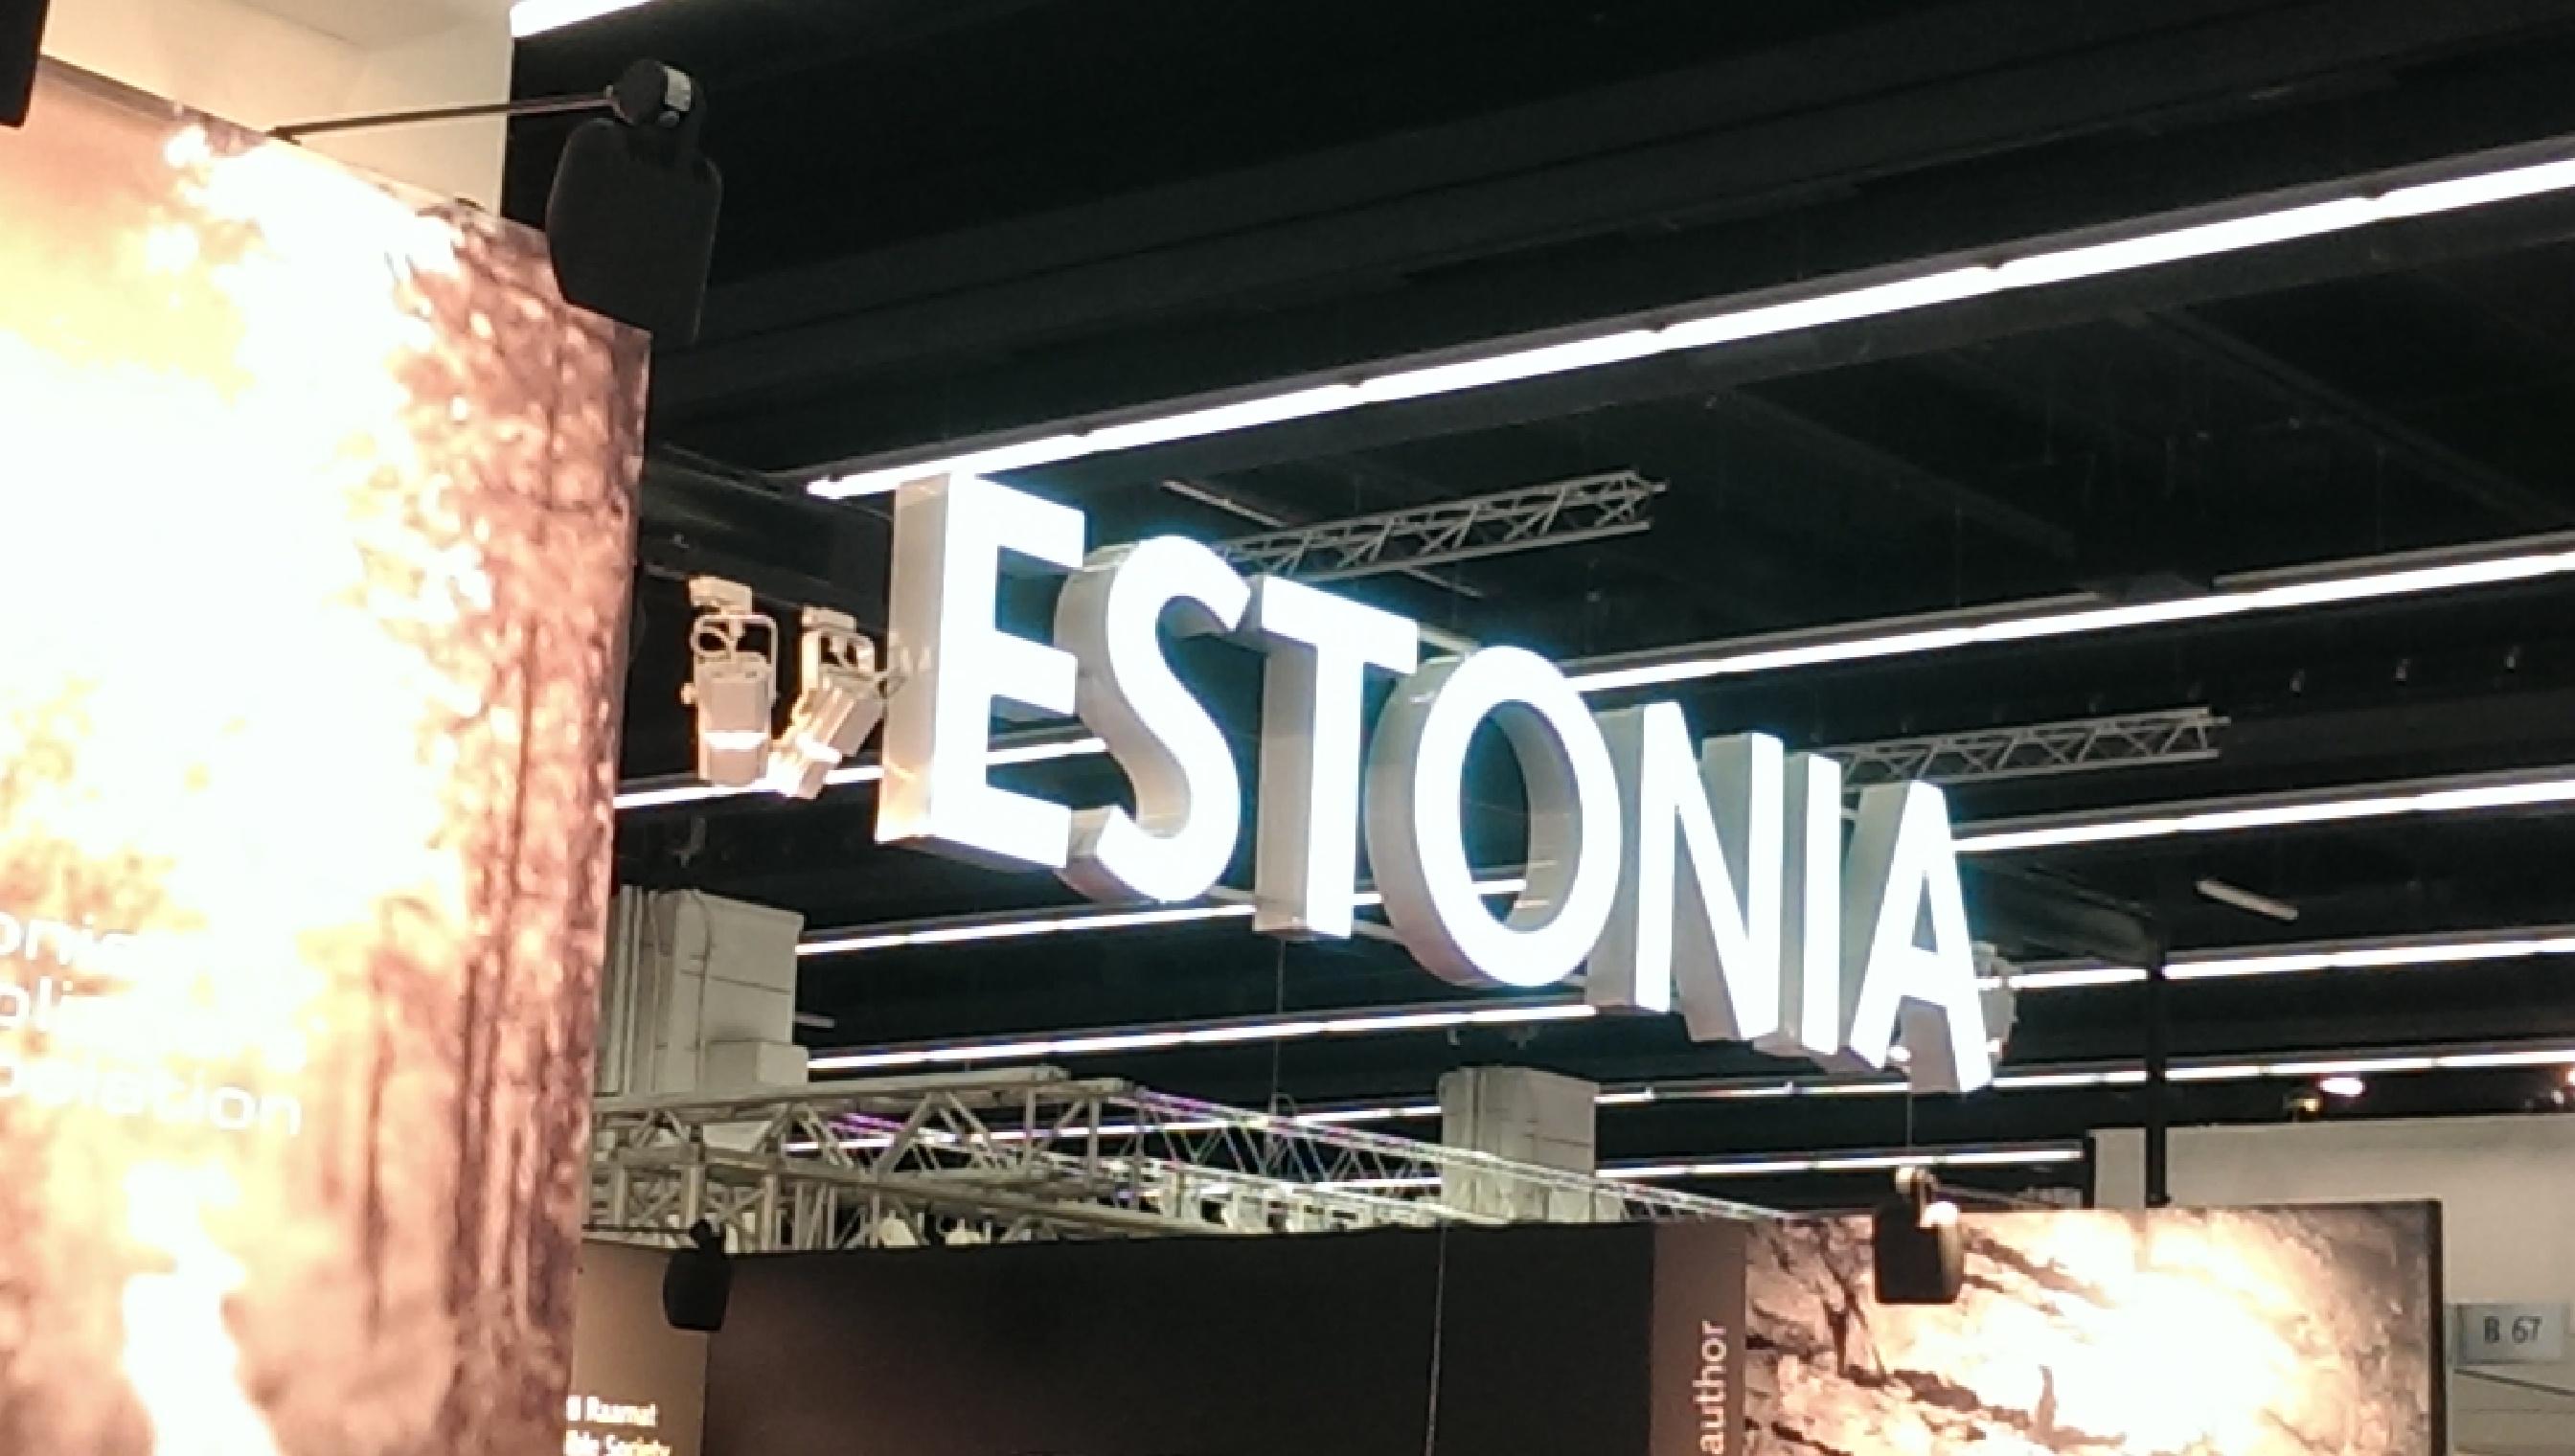 Estonia booth